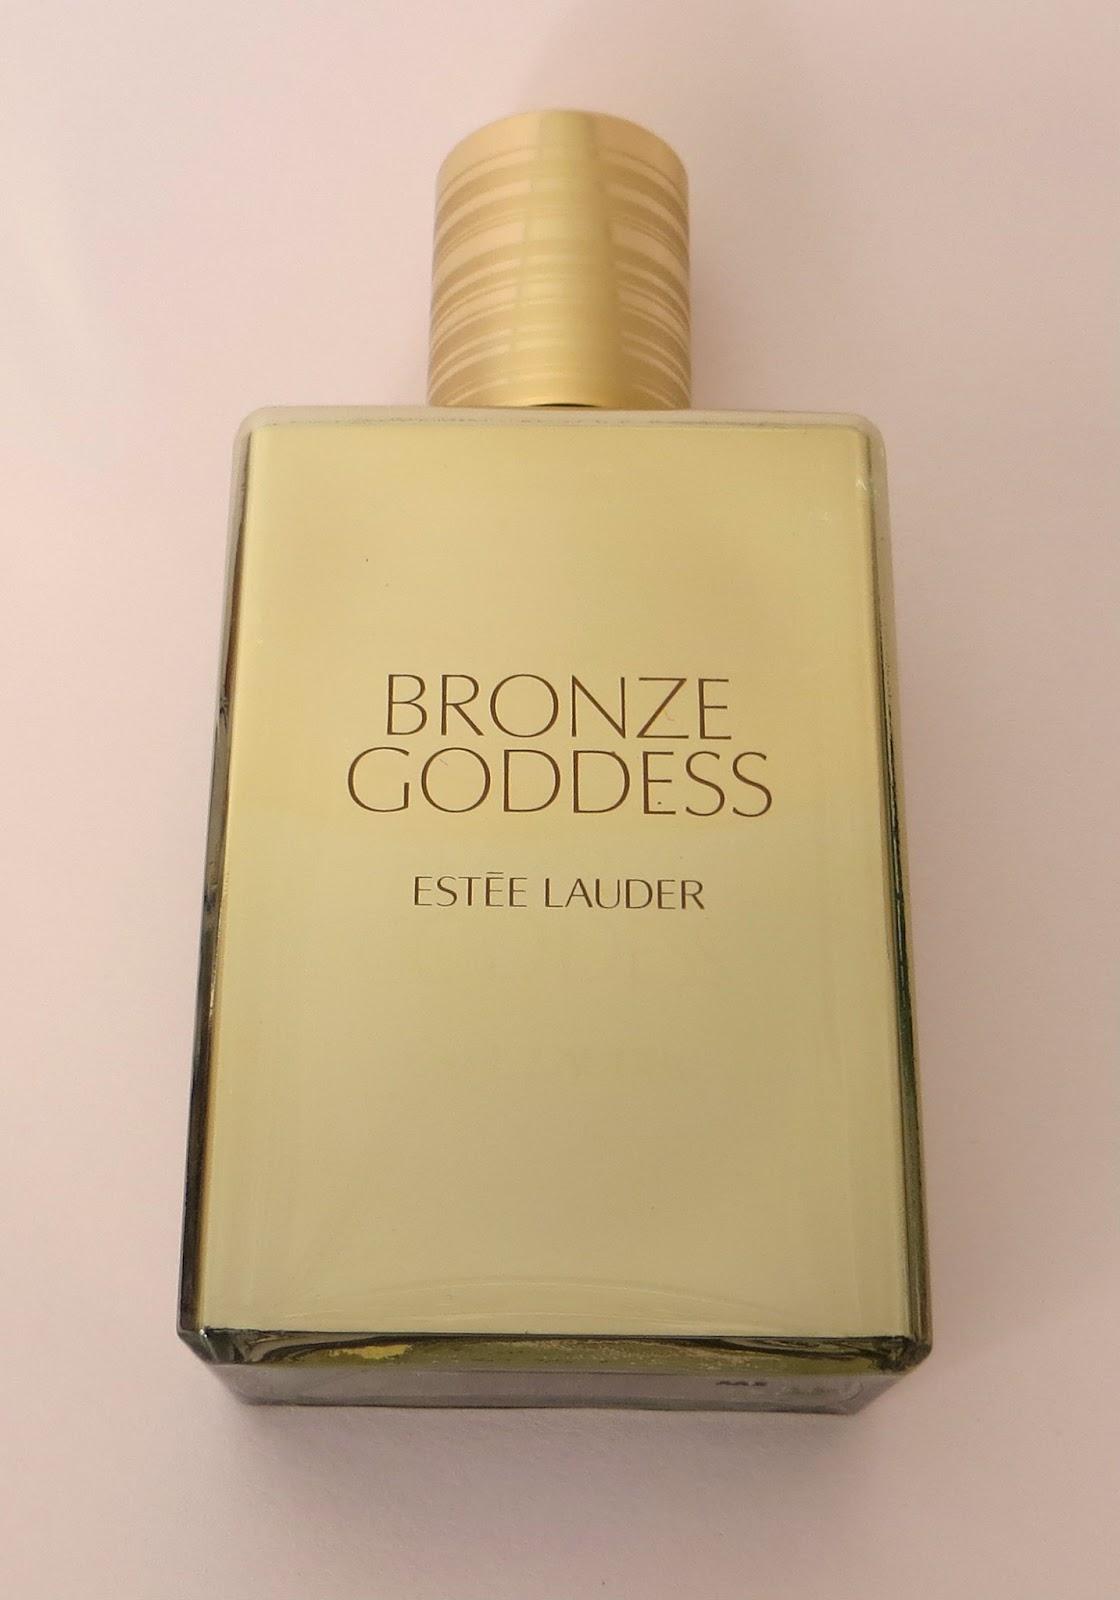 Esteé Lauder Bronze Goddess Eau Fraiche Skinscent